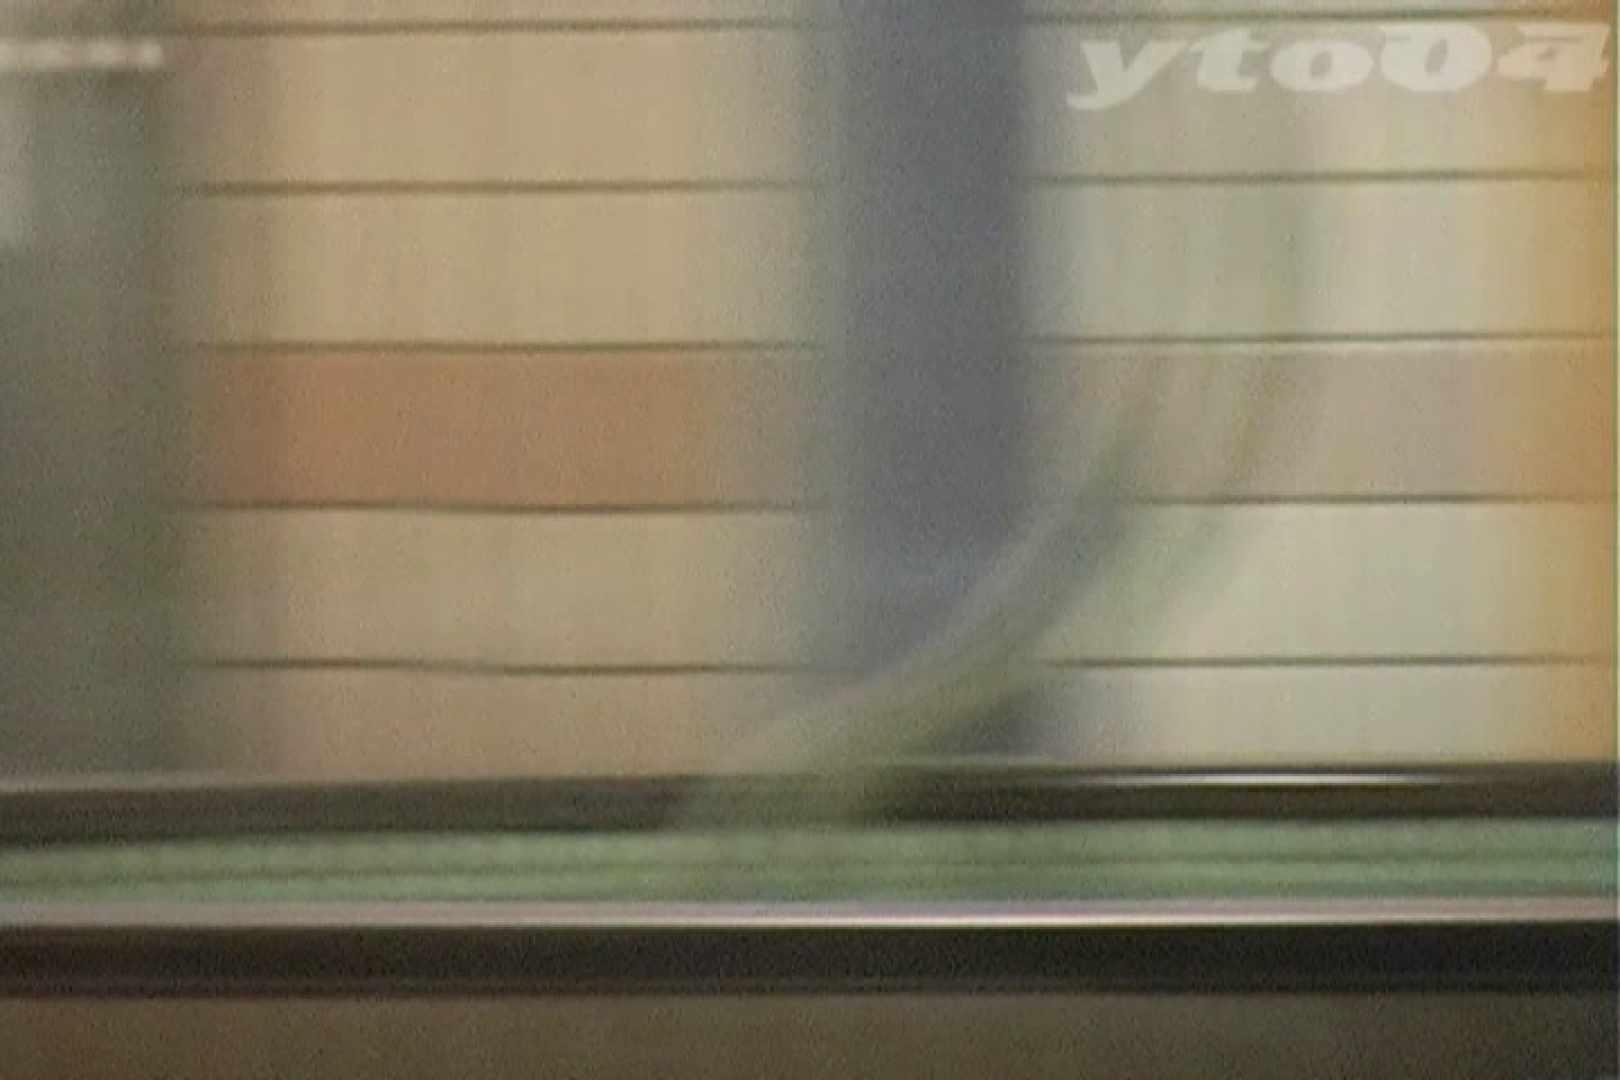 ▲復活限定▲合宿ホテル女風呂盗撮 Vol.24 名作  55pic 22